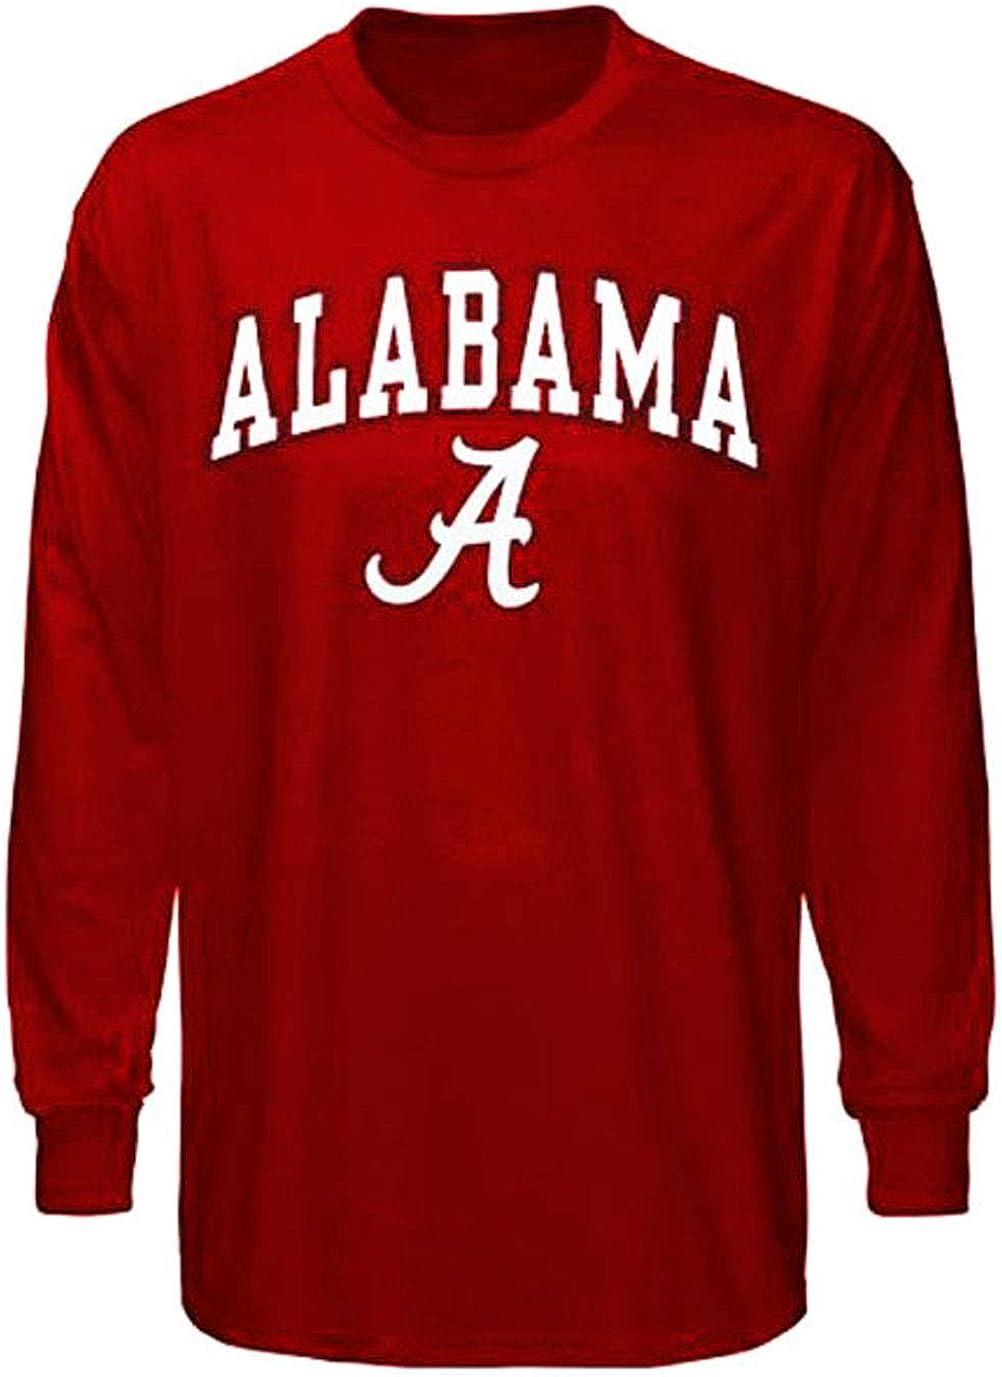 Alabama University Crimson Tide Shirt Long Sleeve T-Shirt